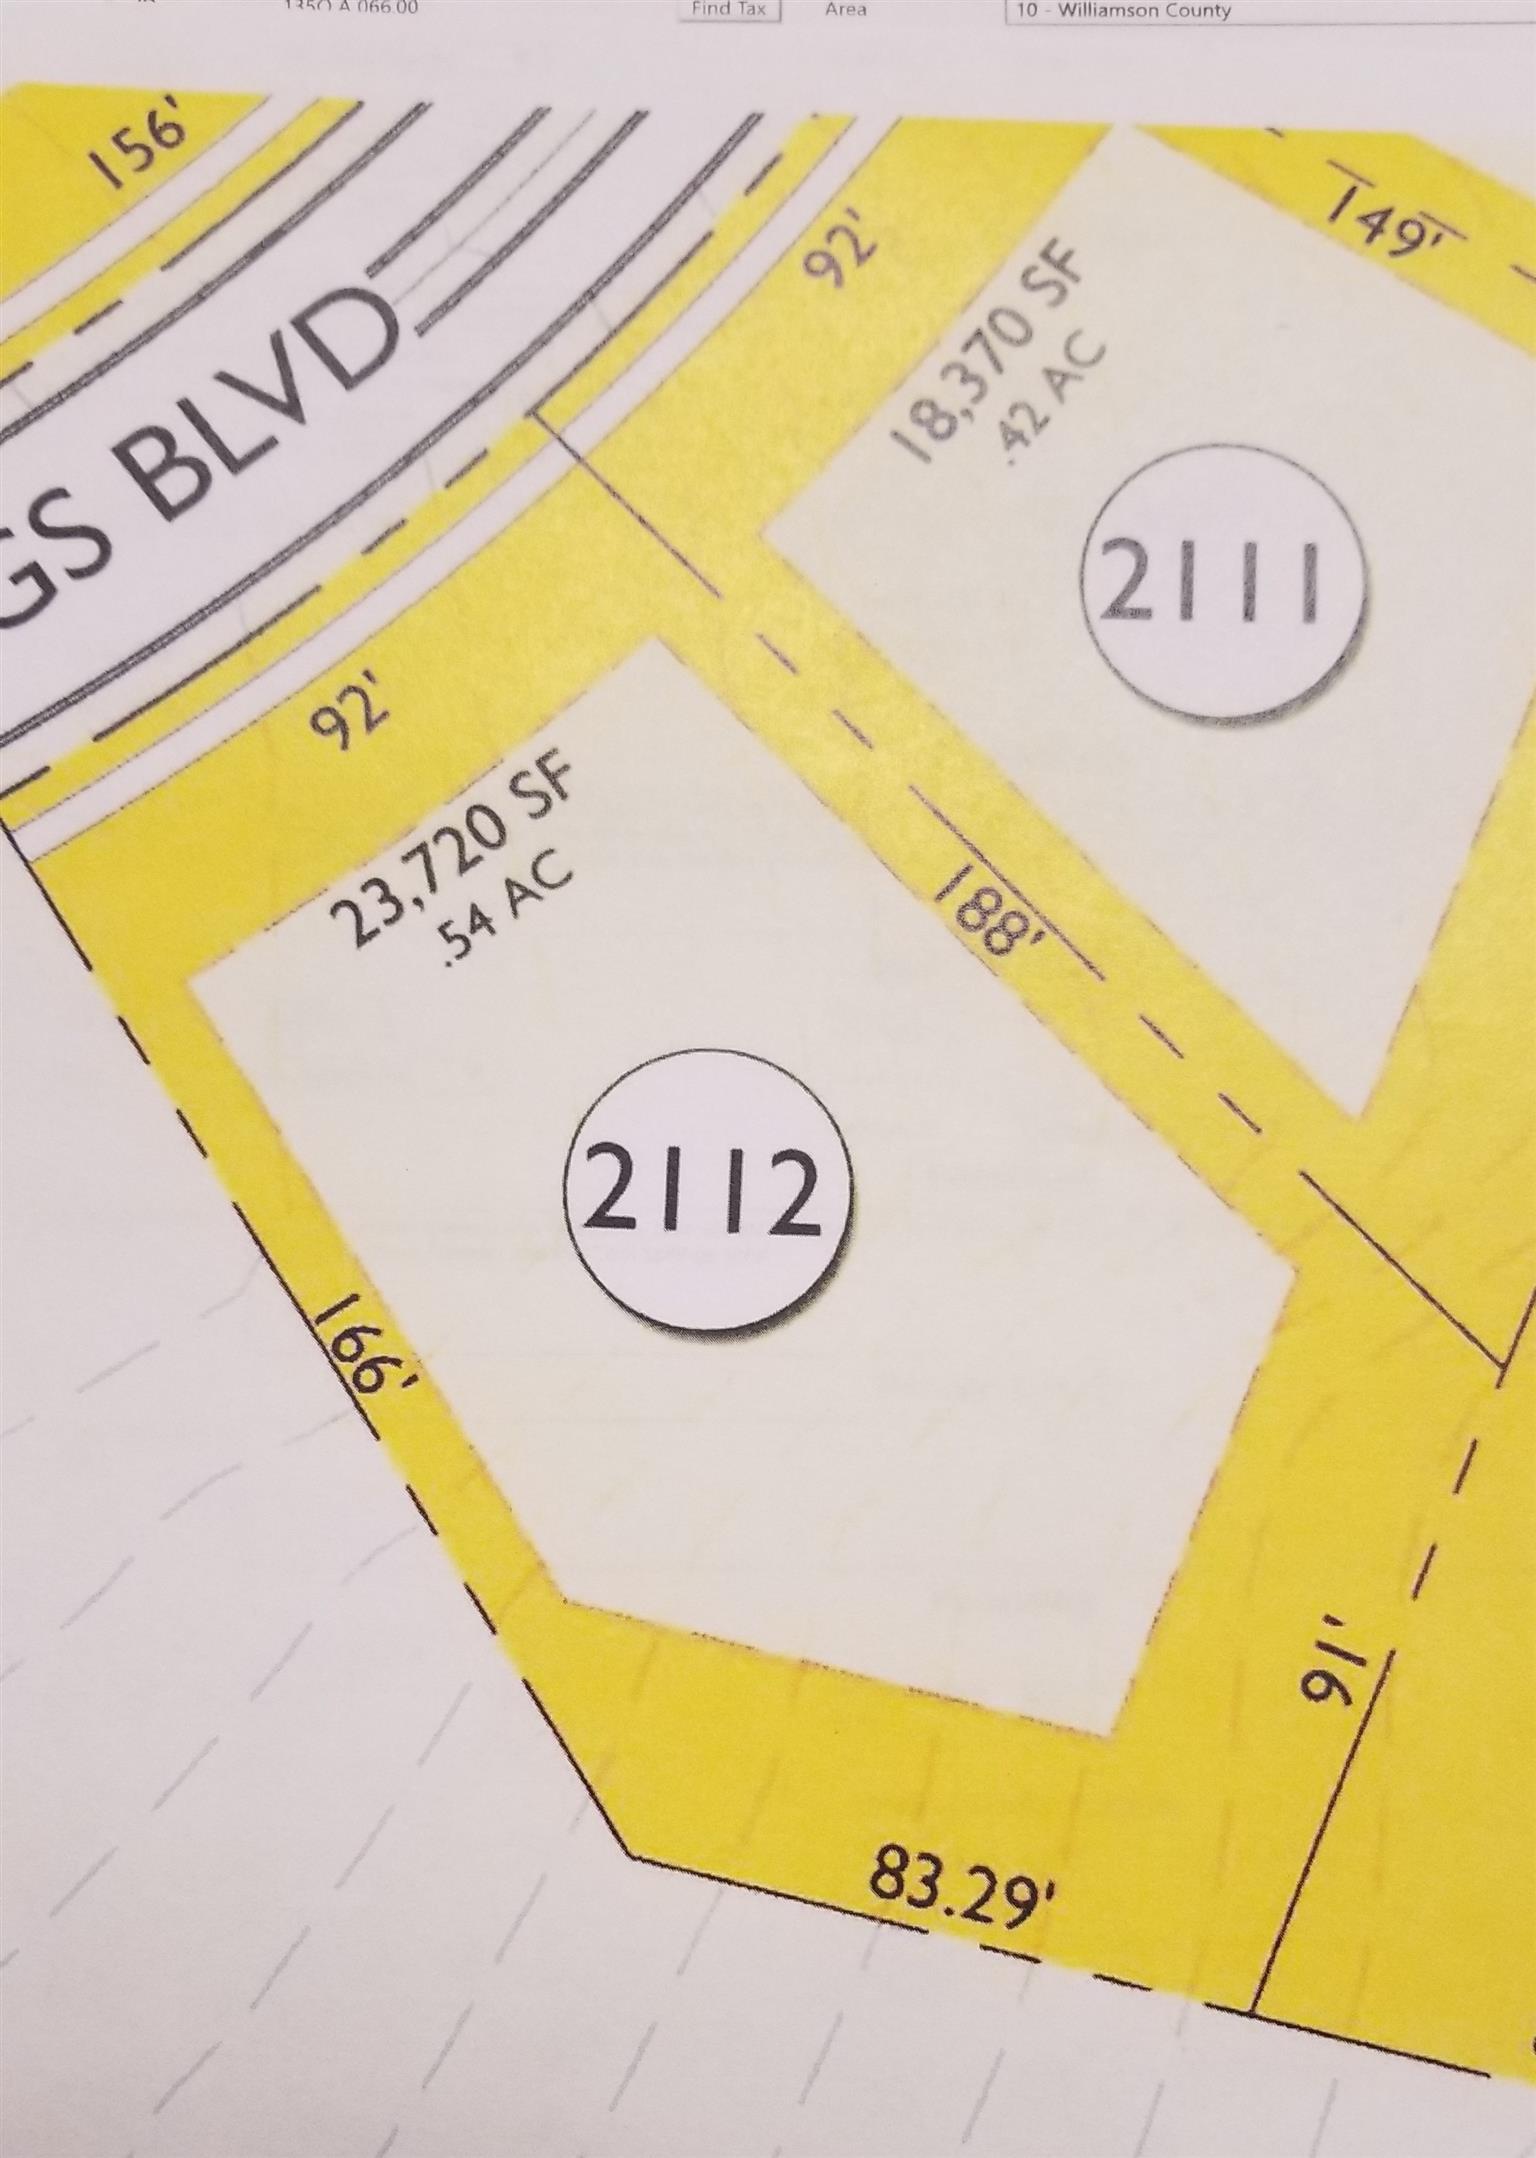 7205 Wildings Blvd (Lot 2112) Property Photo